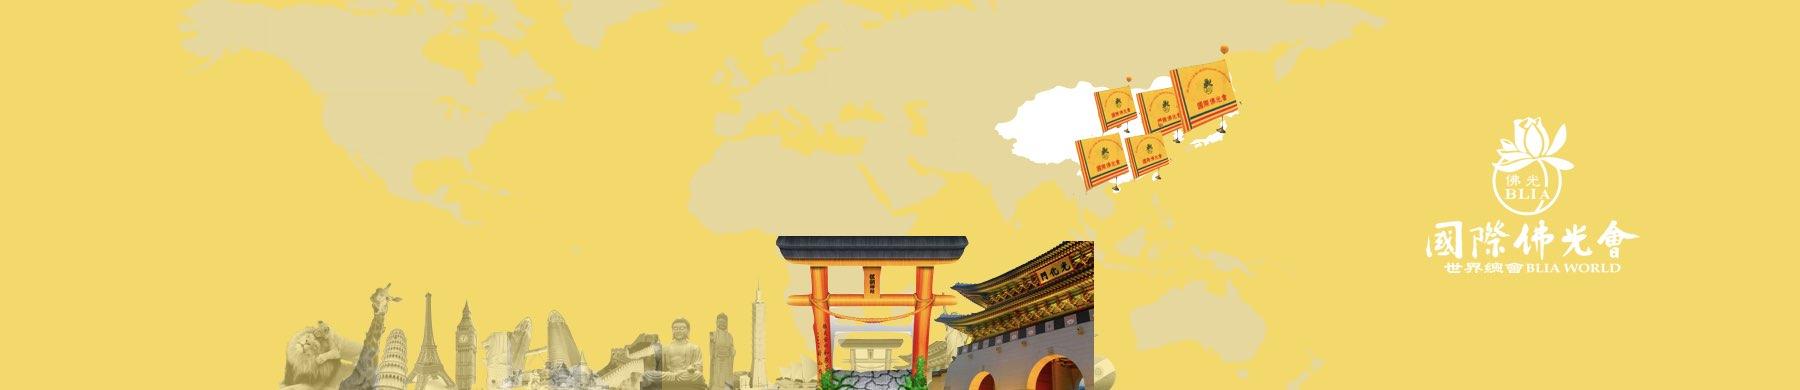 banner-東北亞